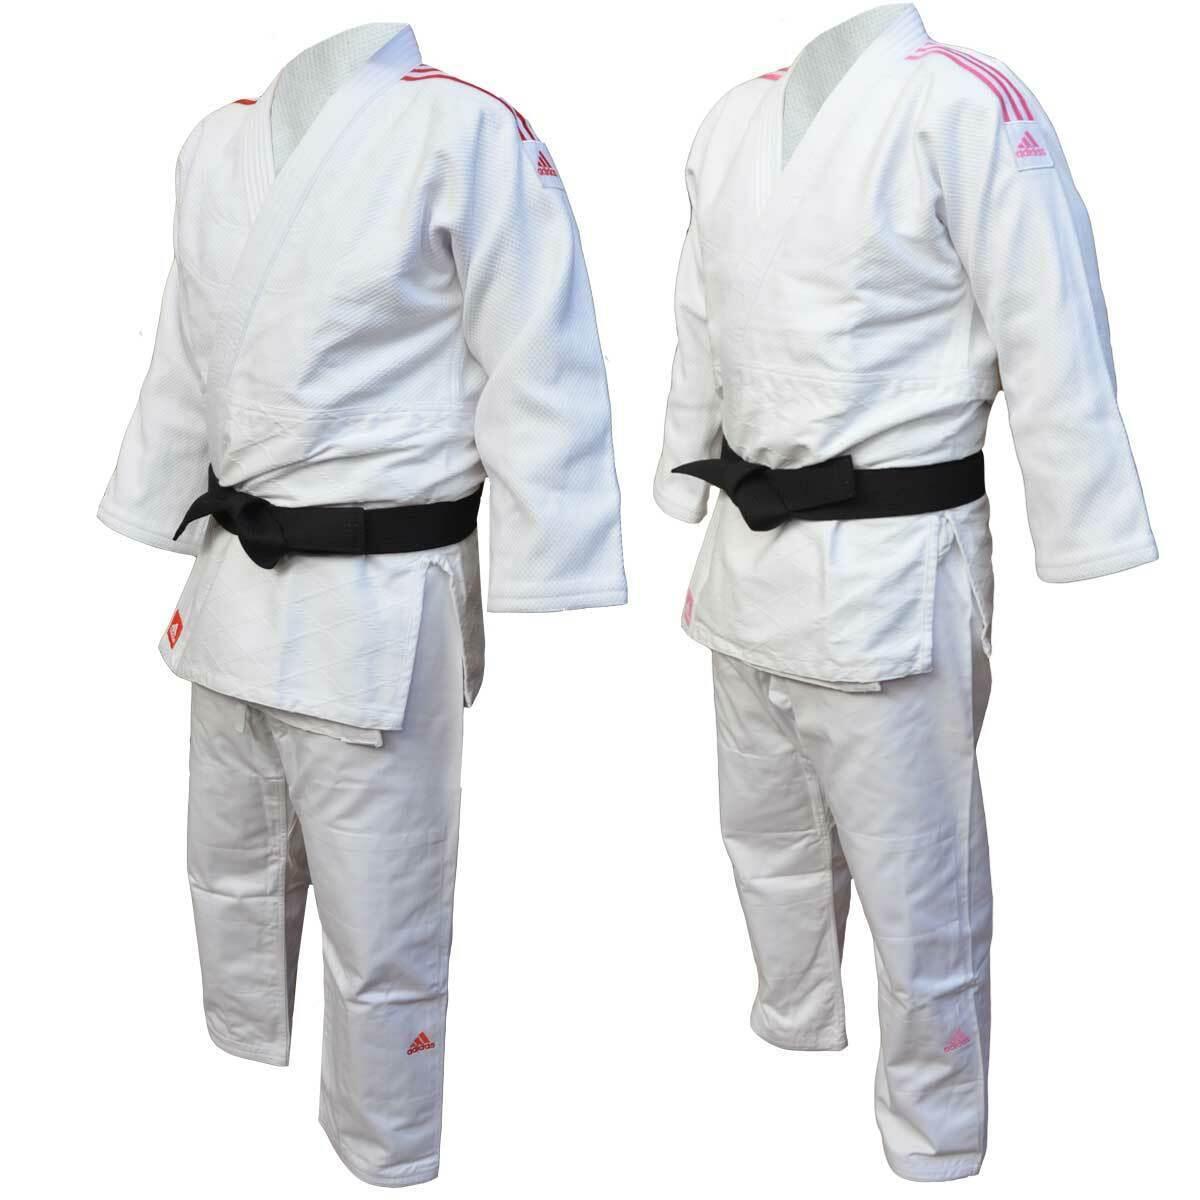 Judogi Modello Contest J650 con cintura bianca Adidas  10202028S